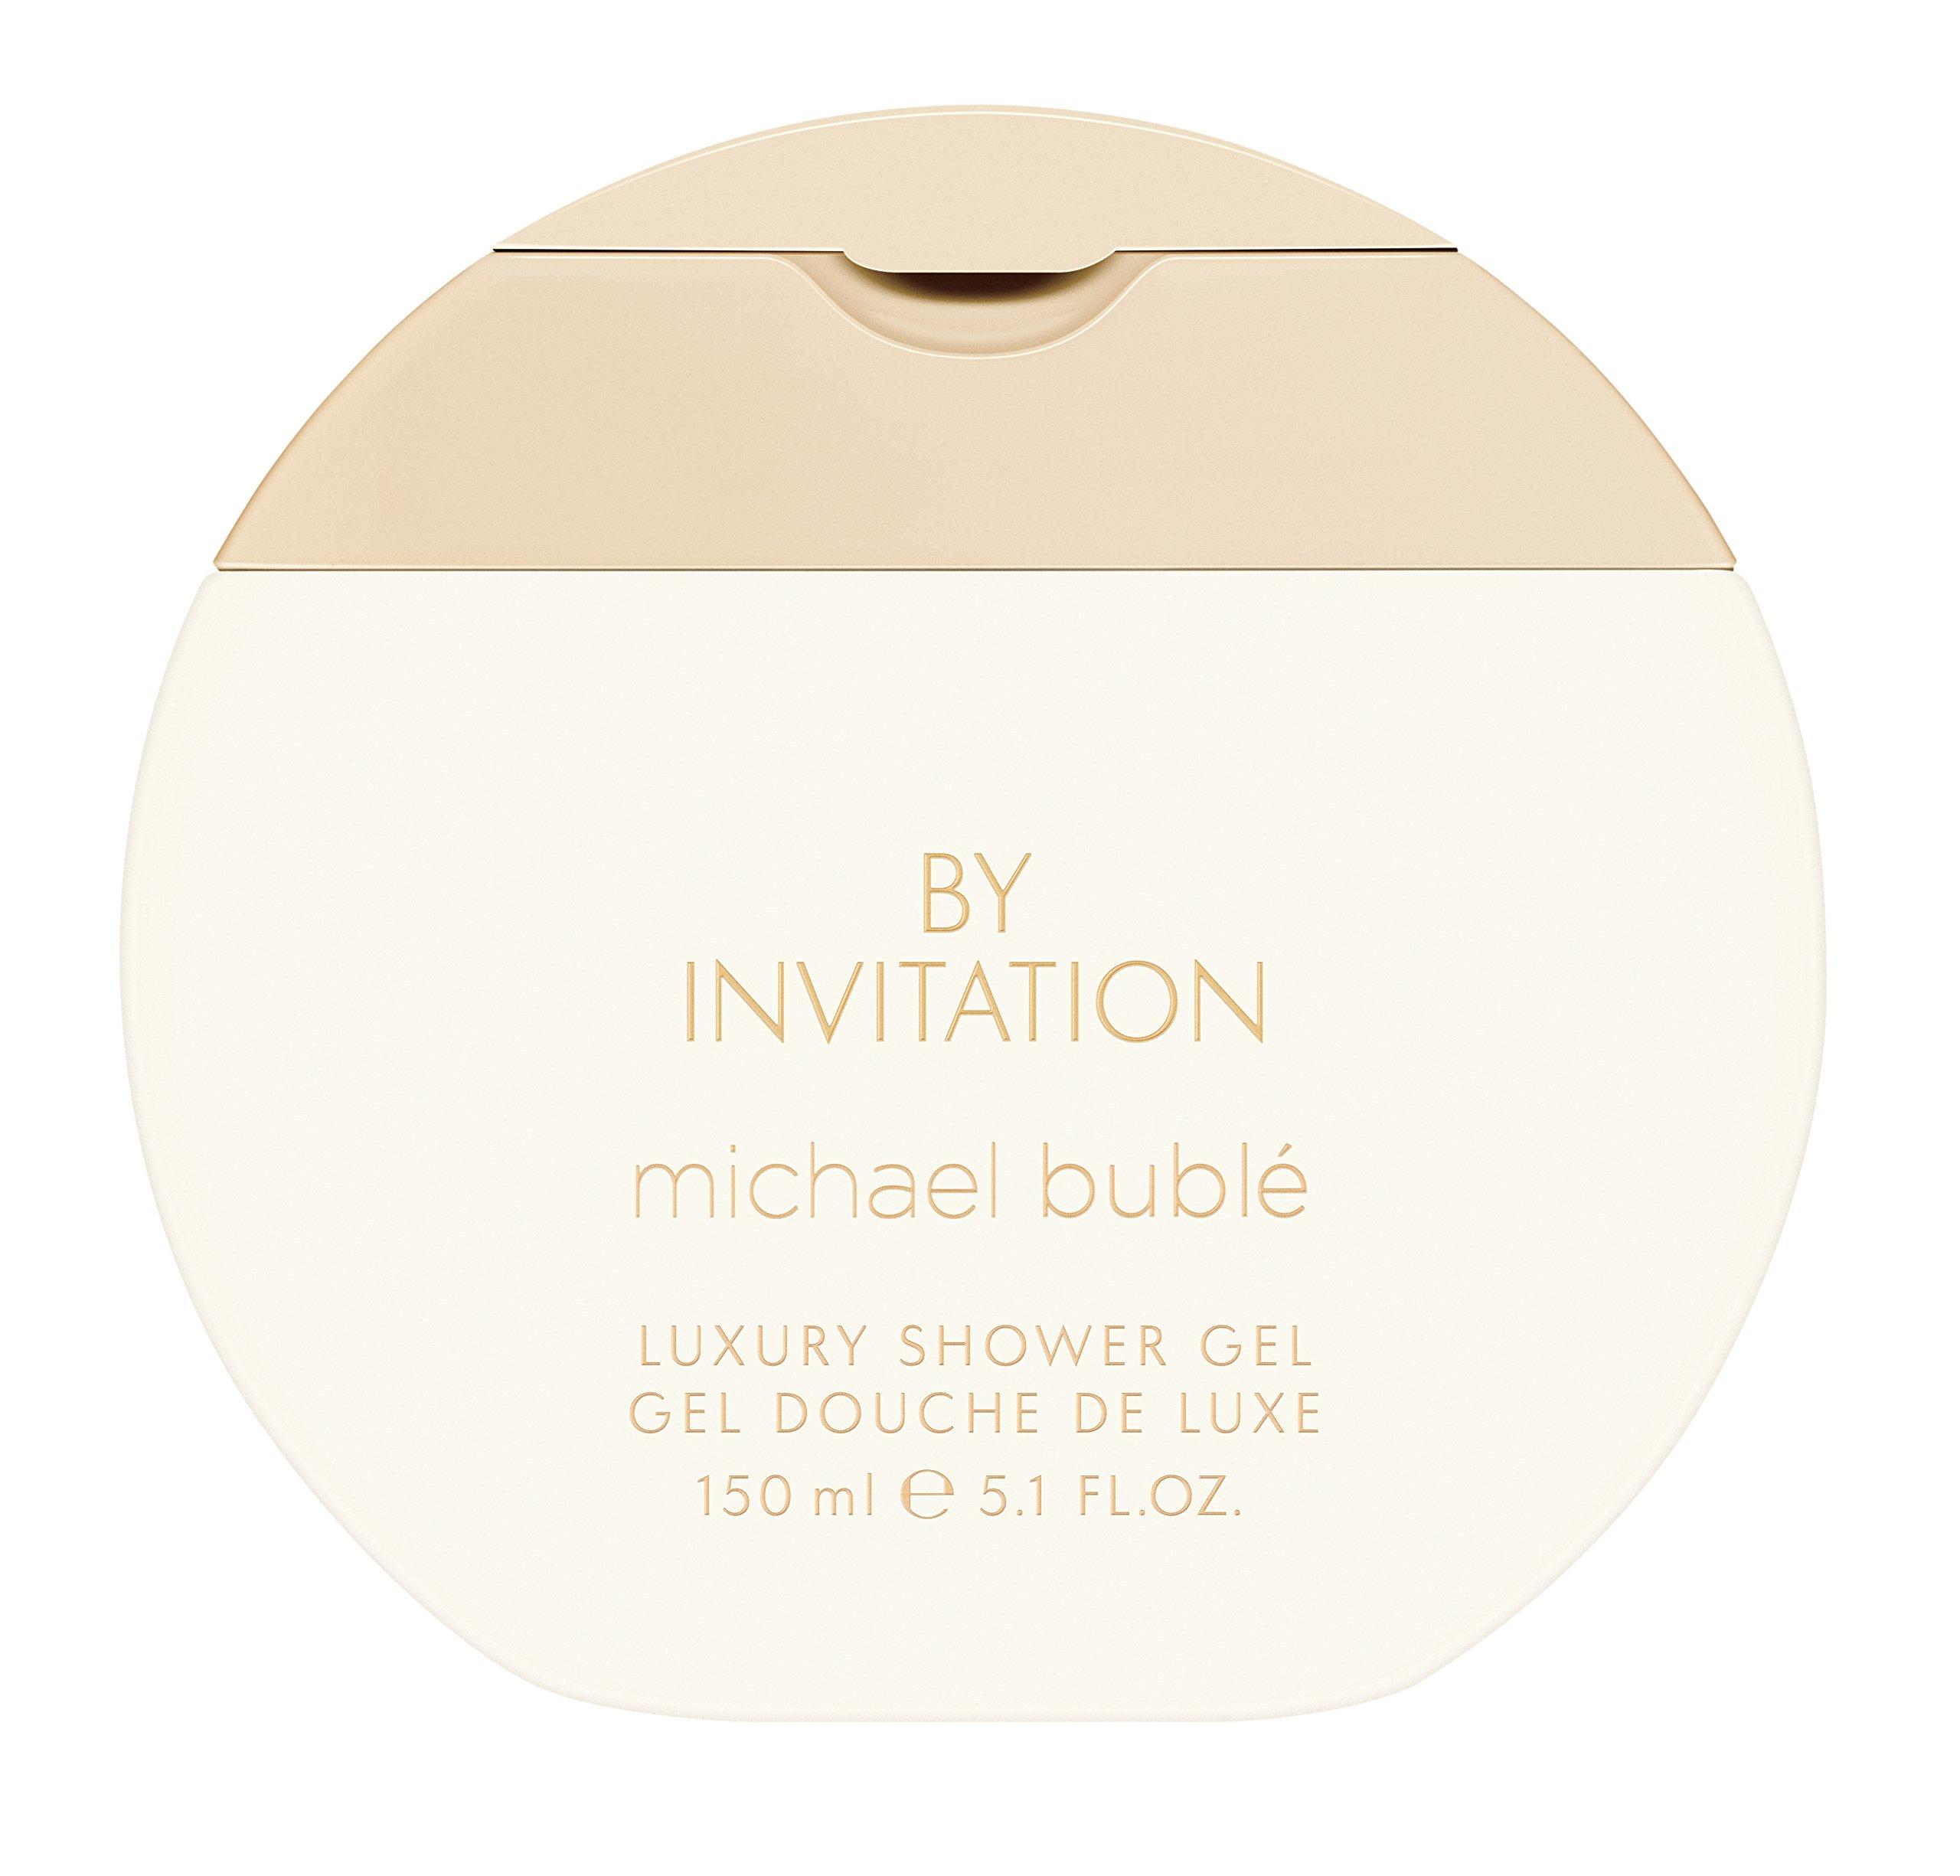 MICHAEL BUBLE By Invitation 150 ml Luxury Shower Gel